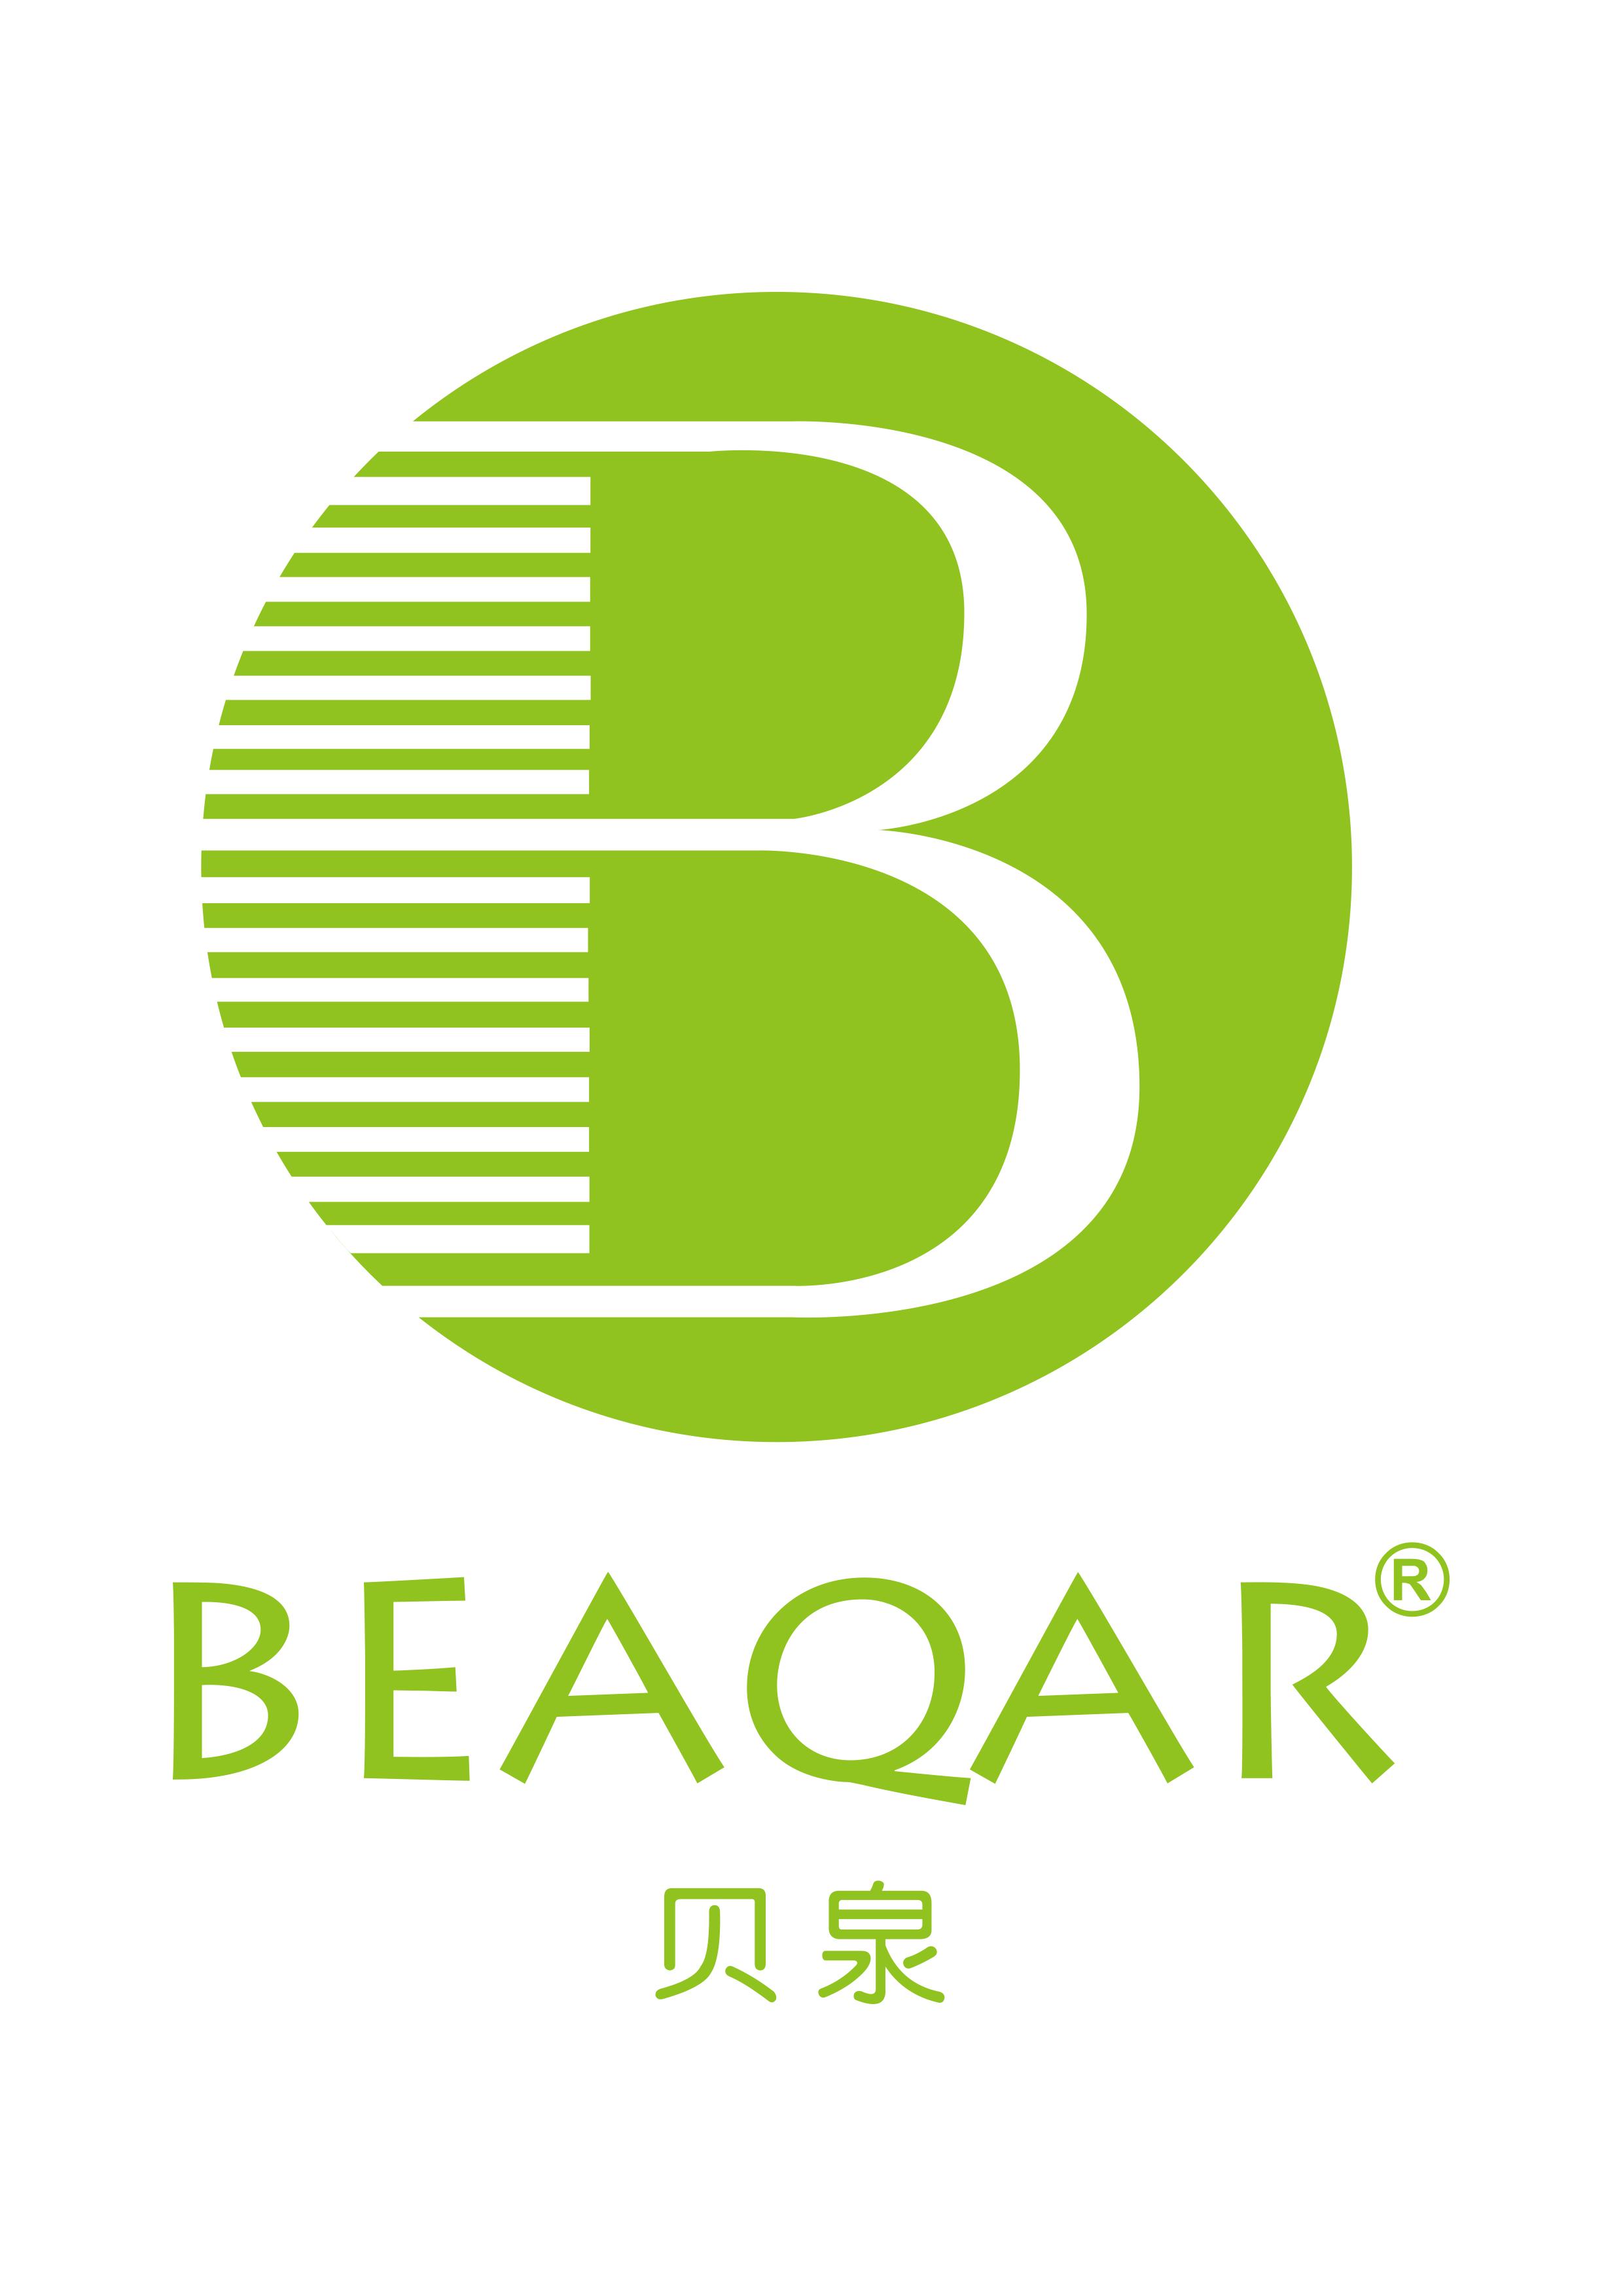 logo logo 标志 设计 图标 2480_3508 竖版 竖屏